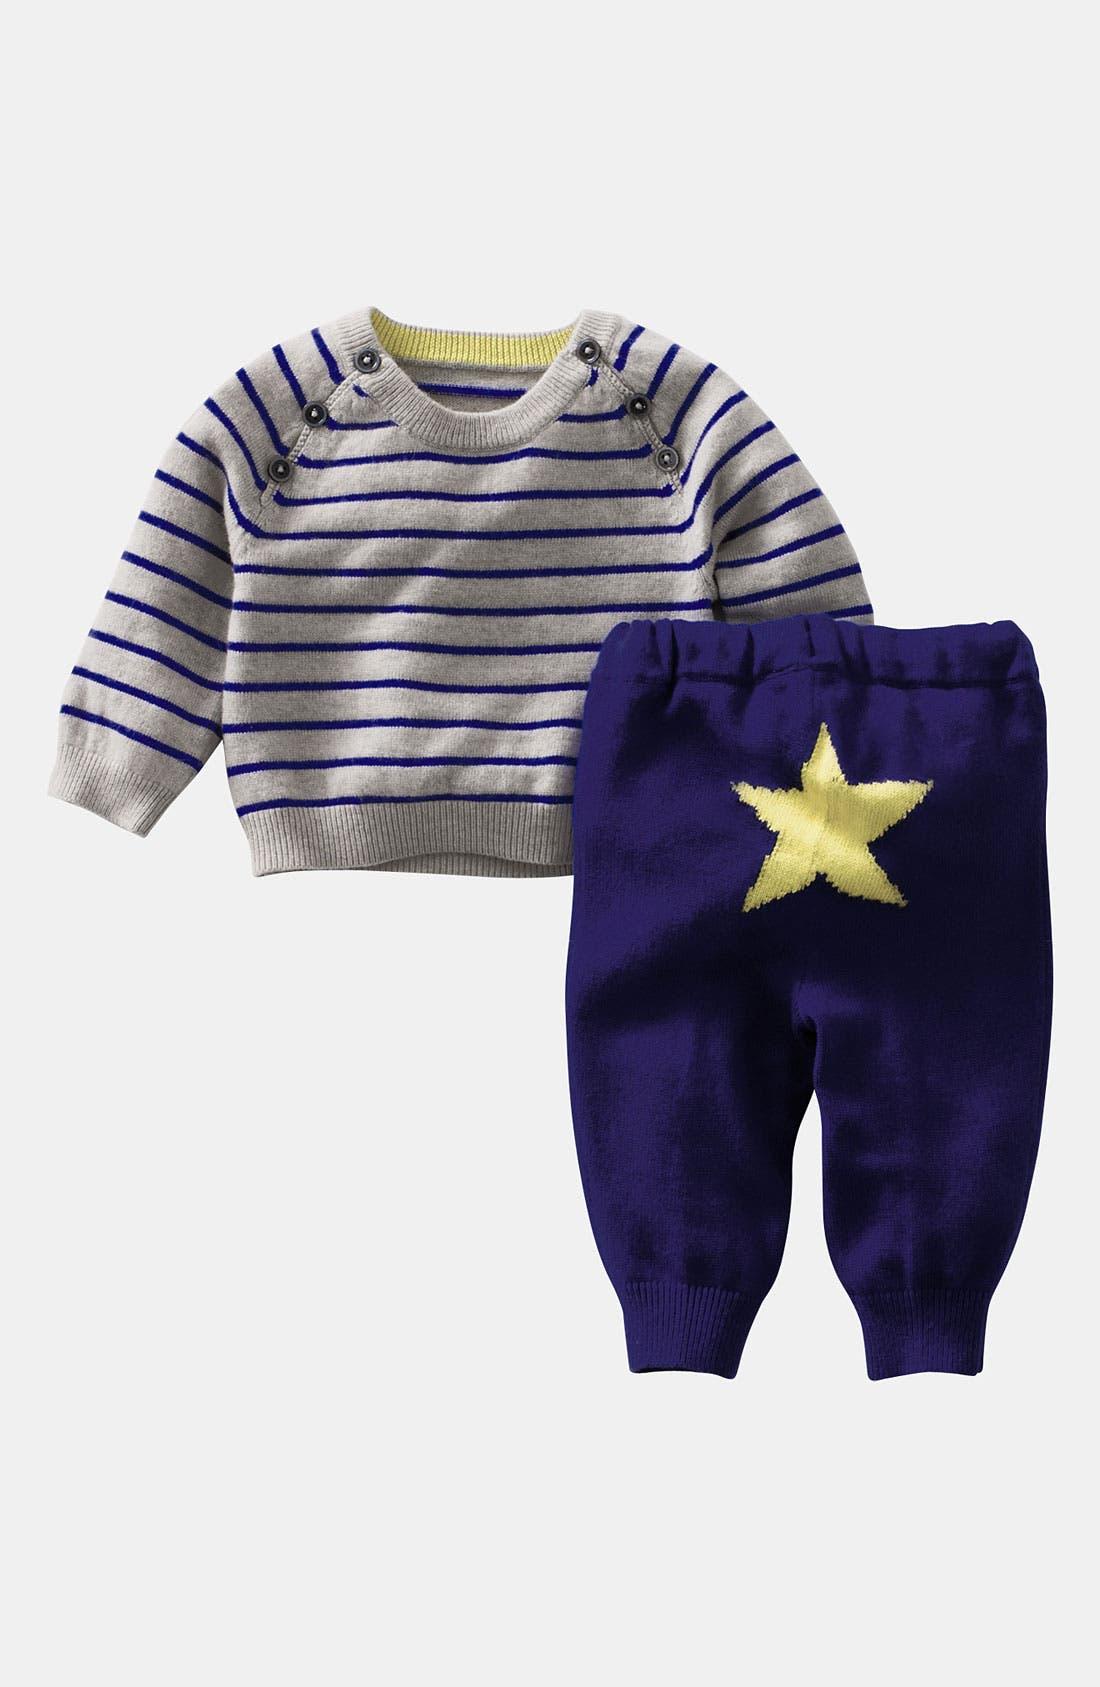 Alternate Image 1 Selected - Mini Boden Knit Sweater & Pants (Infants)